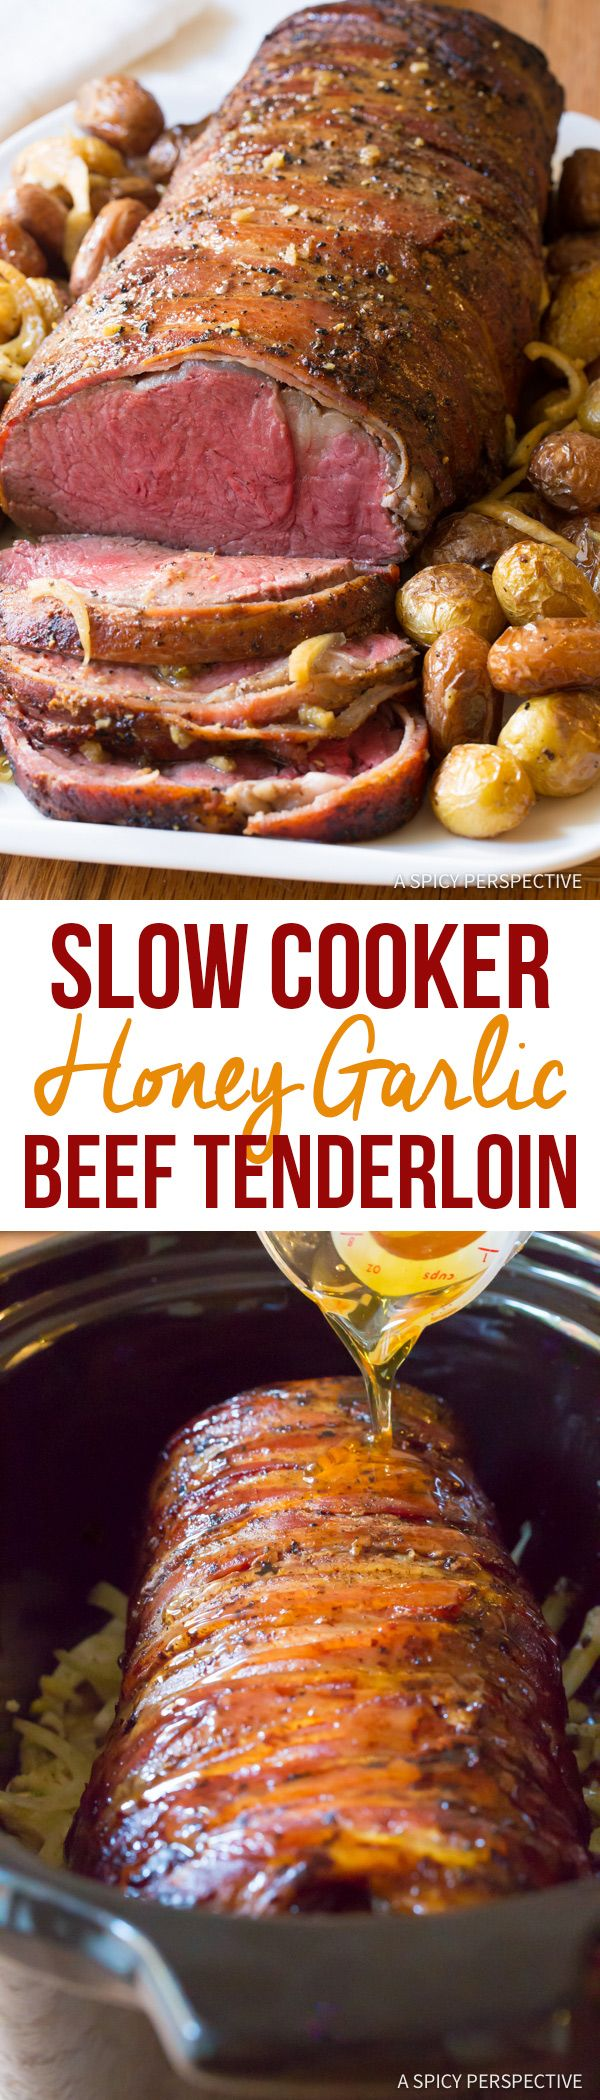 25+ best ideas about Slow cooker pork roast on Pinterest ...